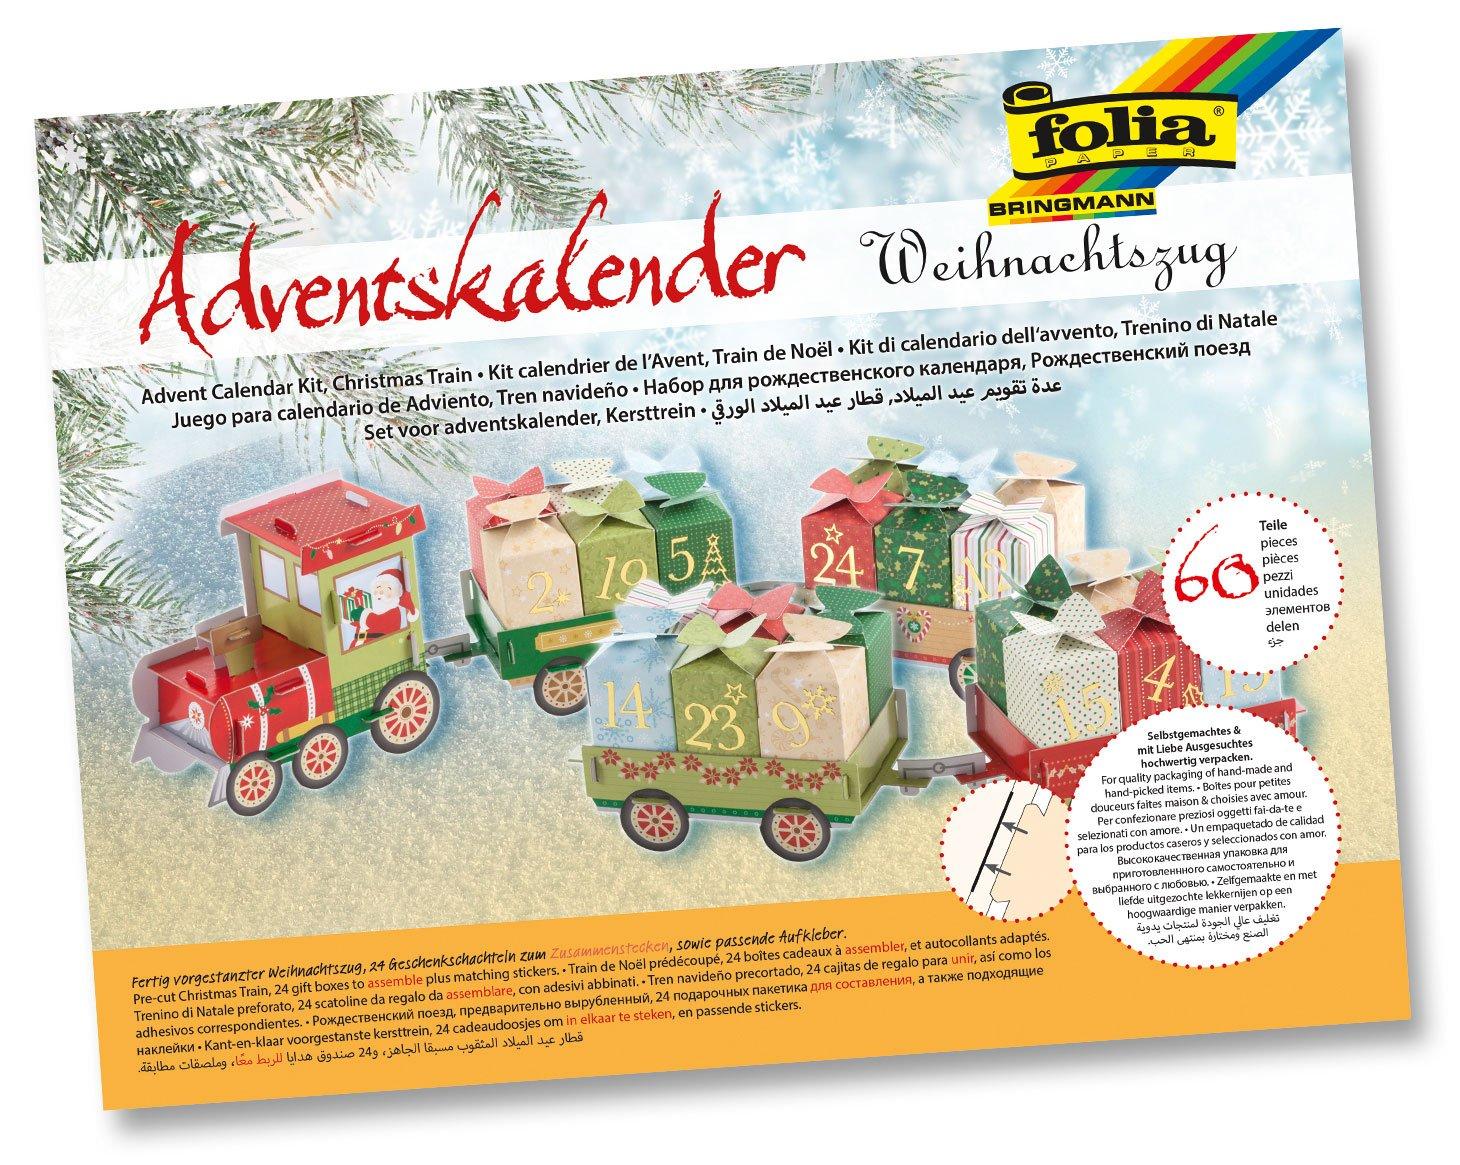 folia 9394 Adventskalender'Weihnachtszug', 60-teilig